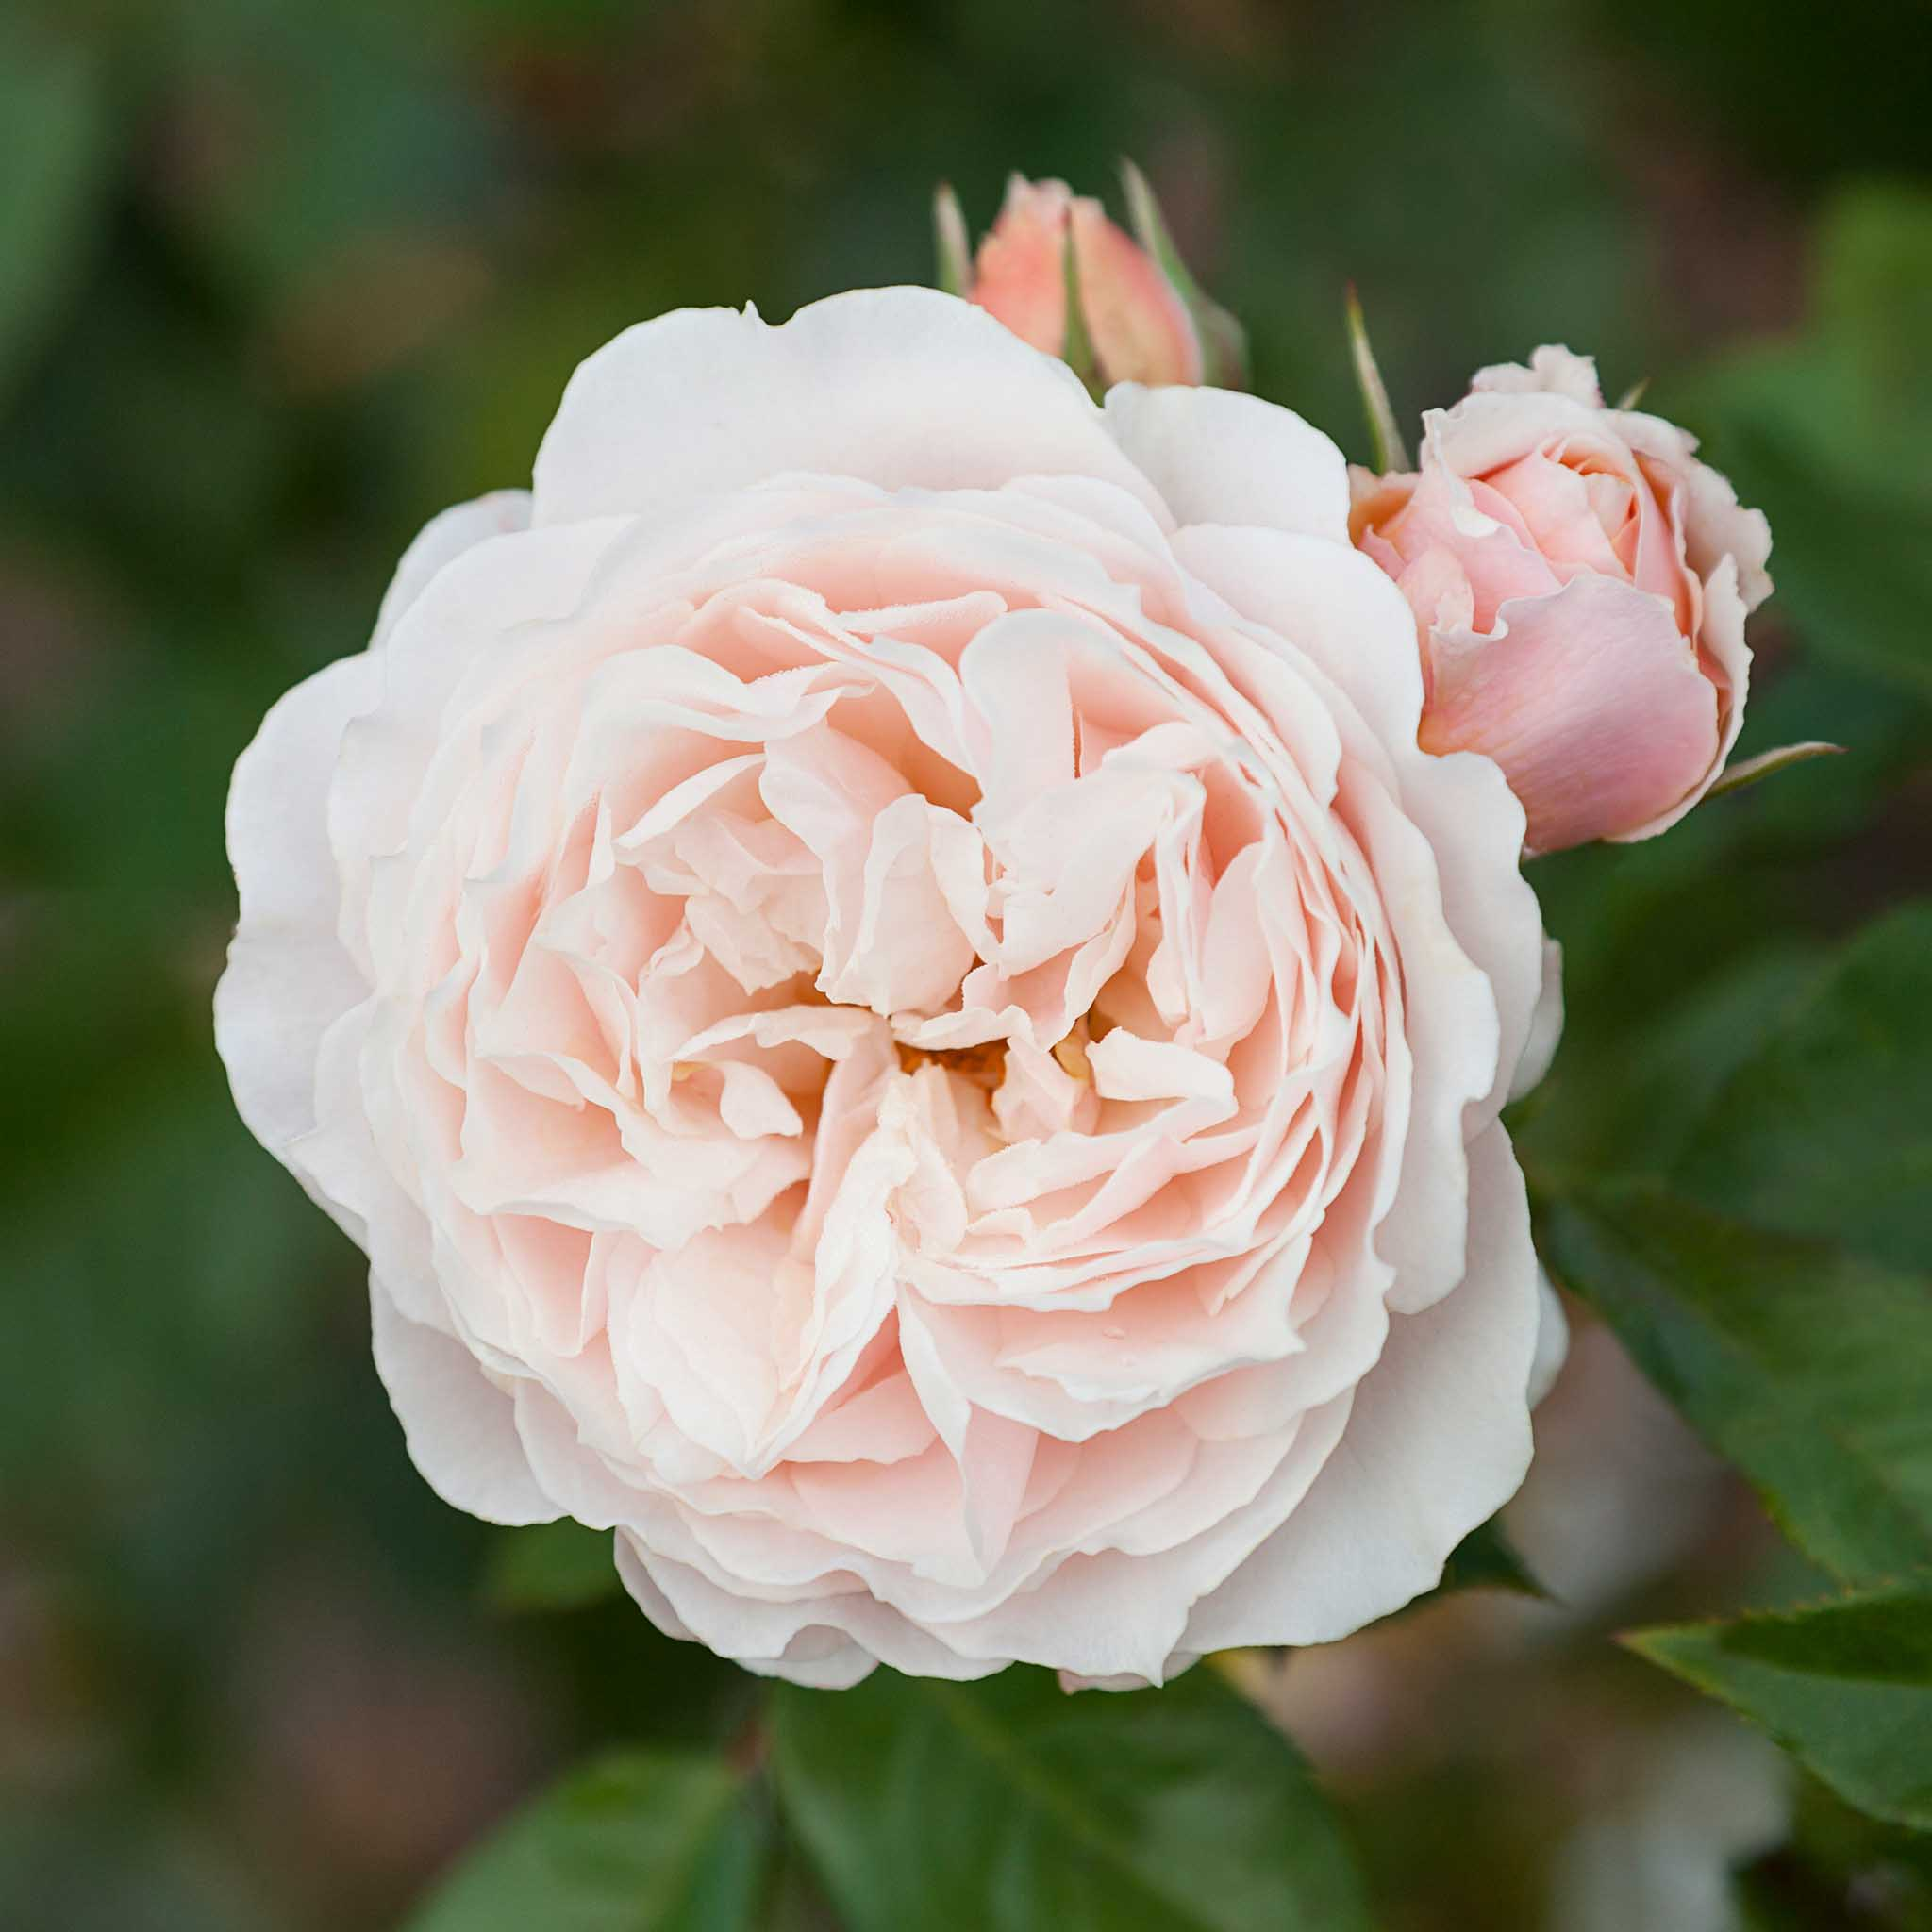 roses-reduced-14.jpg